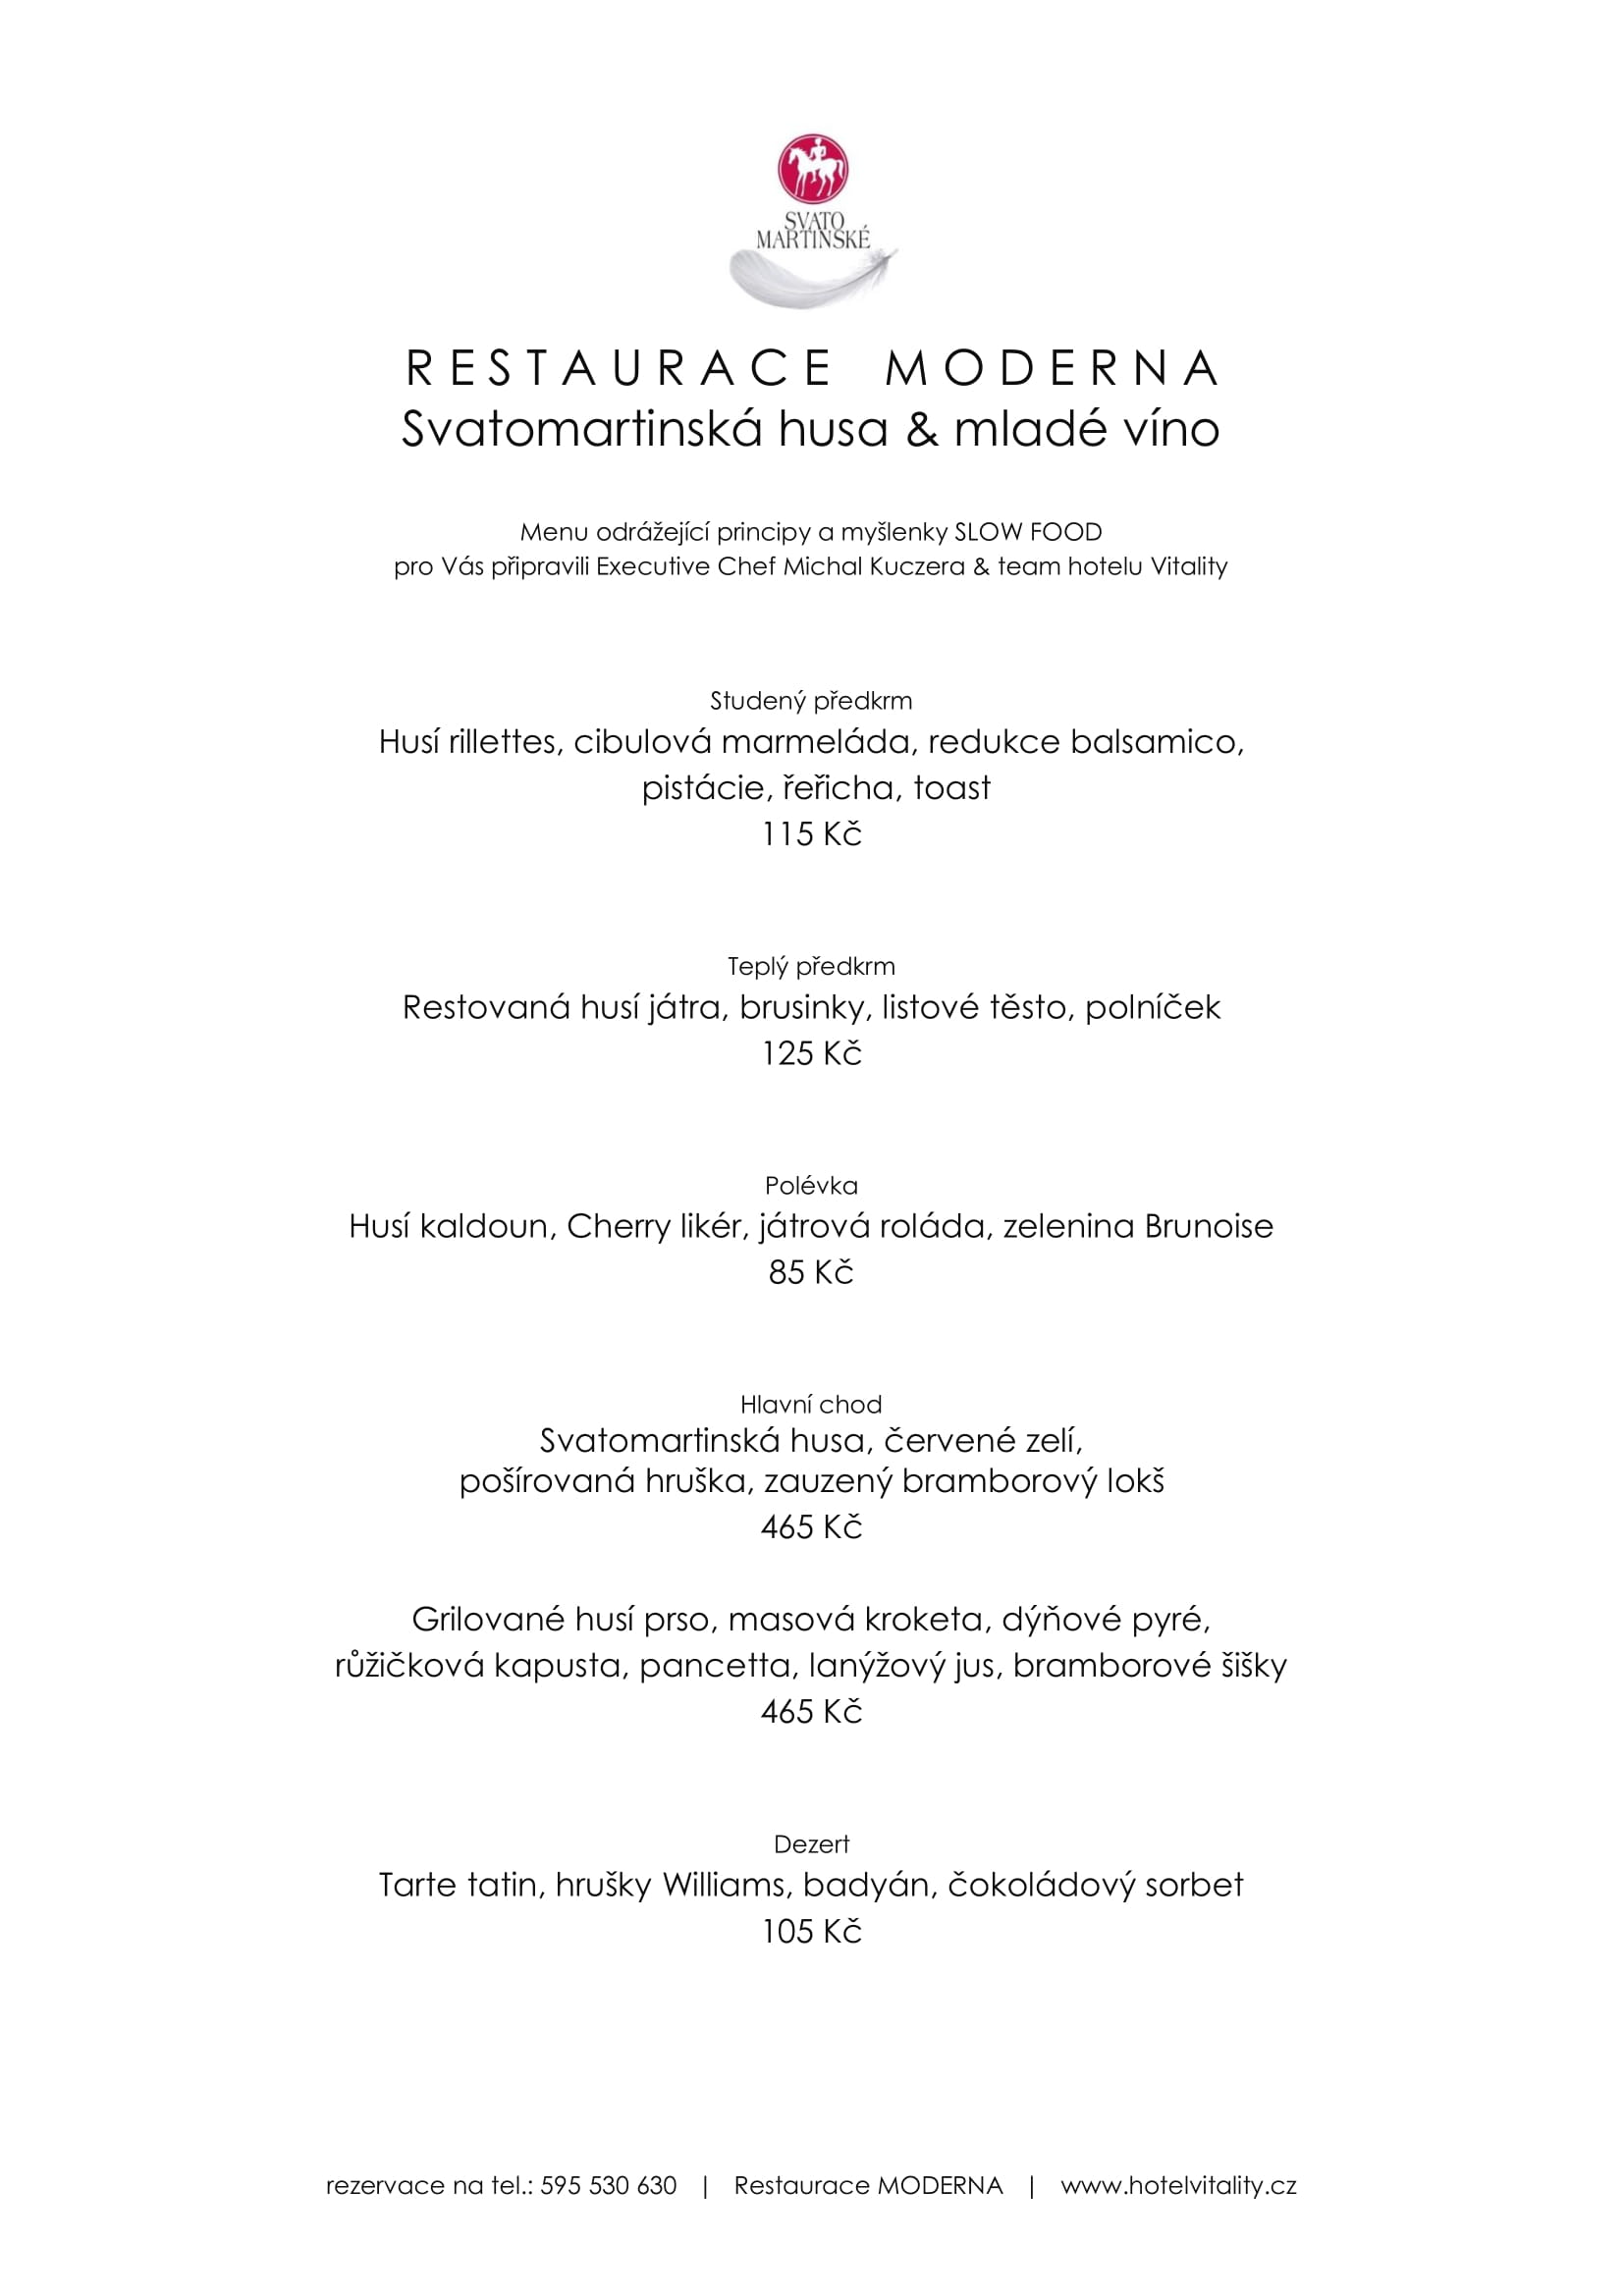 Svatomartinská husa & mladé víno restaurace Moderna